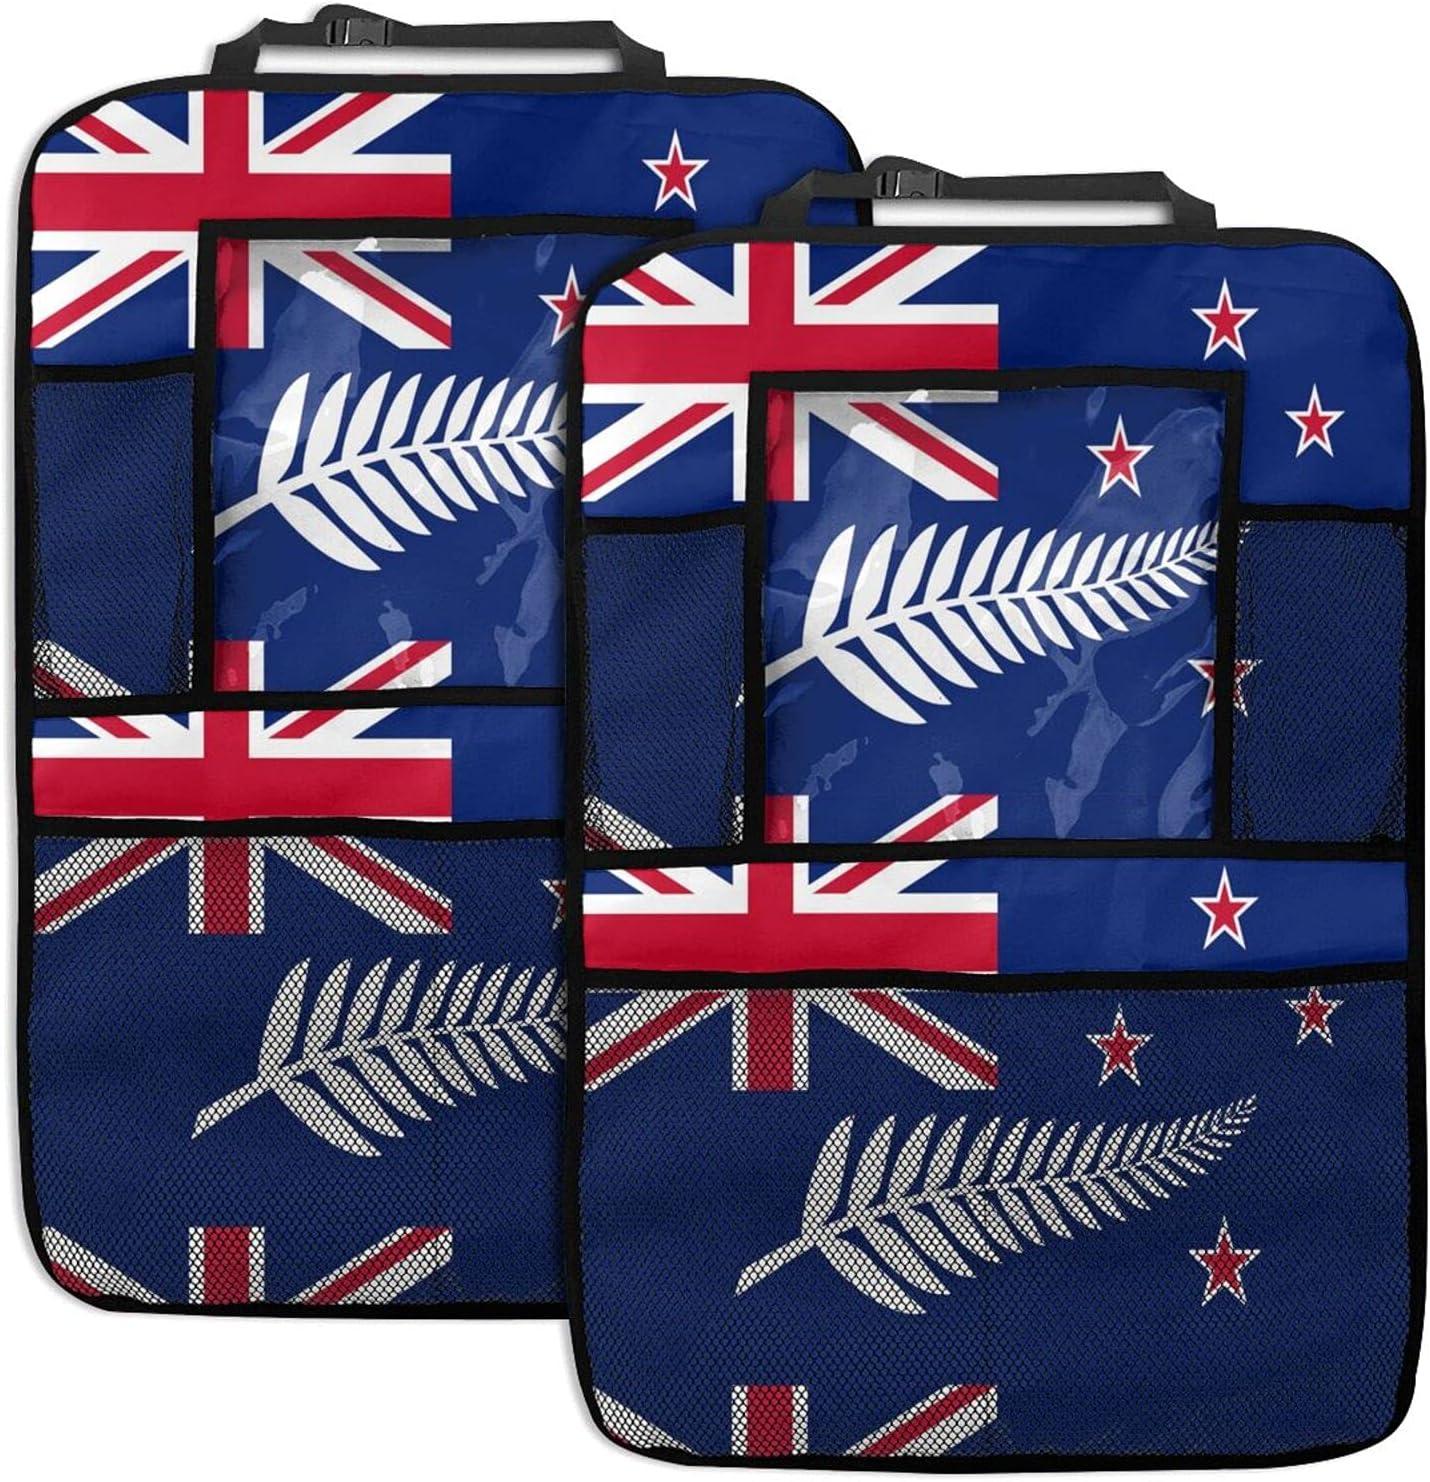 New Zealand Car Seat Back Orga Function Multi Organizer Free shipping lowest price